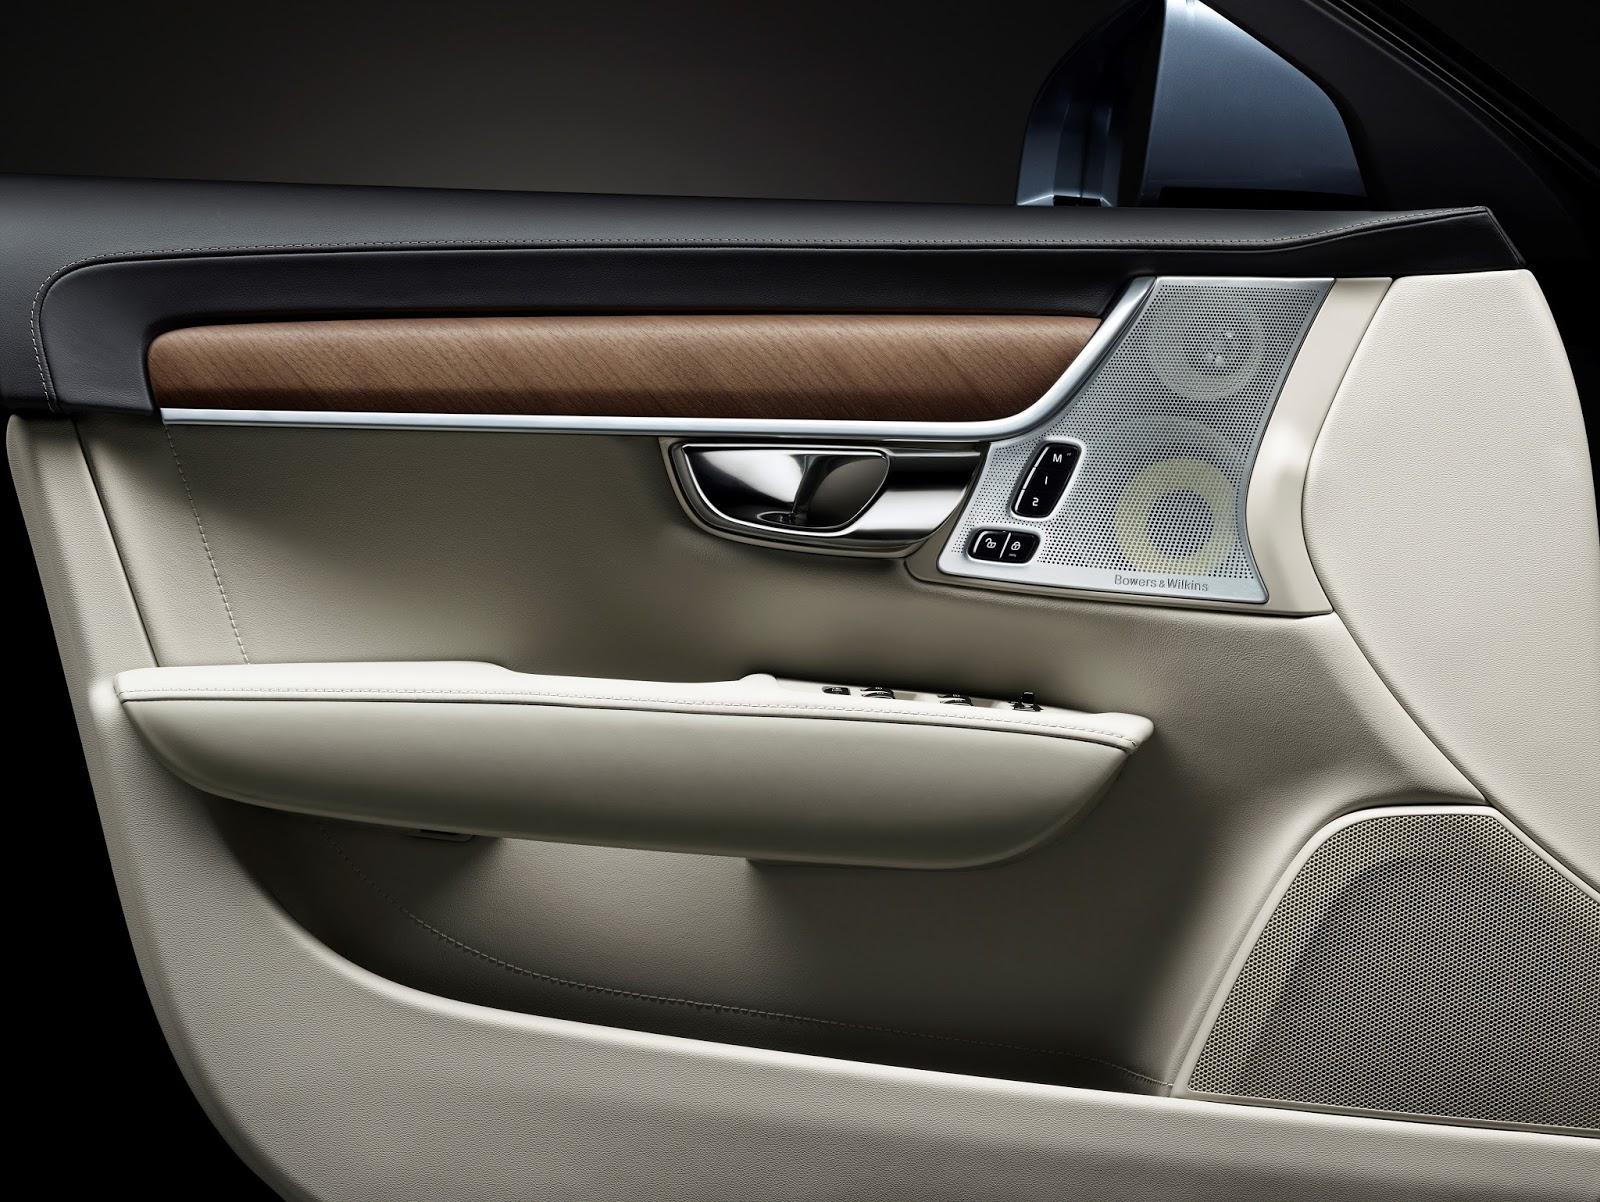 170074 Interior driver door Volvo S90 Το νέο Volvo S90 έρχεται και βάζει φωτιά στον ανταγωνισμό premium sedan, Volvo, Volvo Cars, Volvo S90